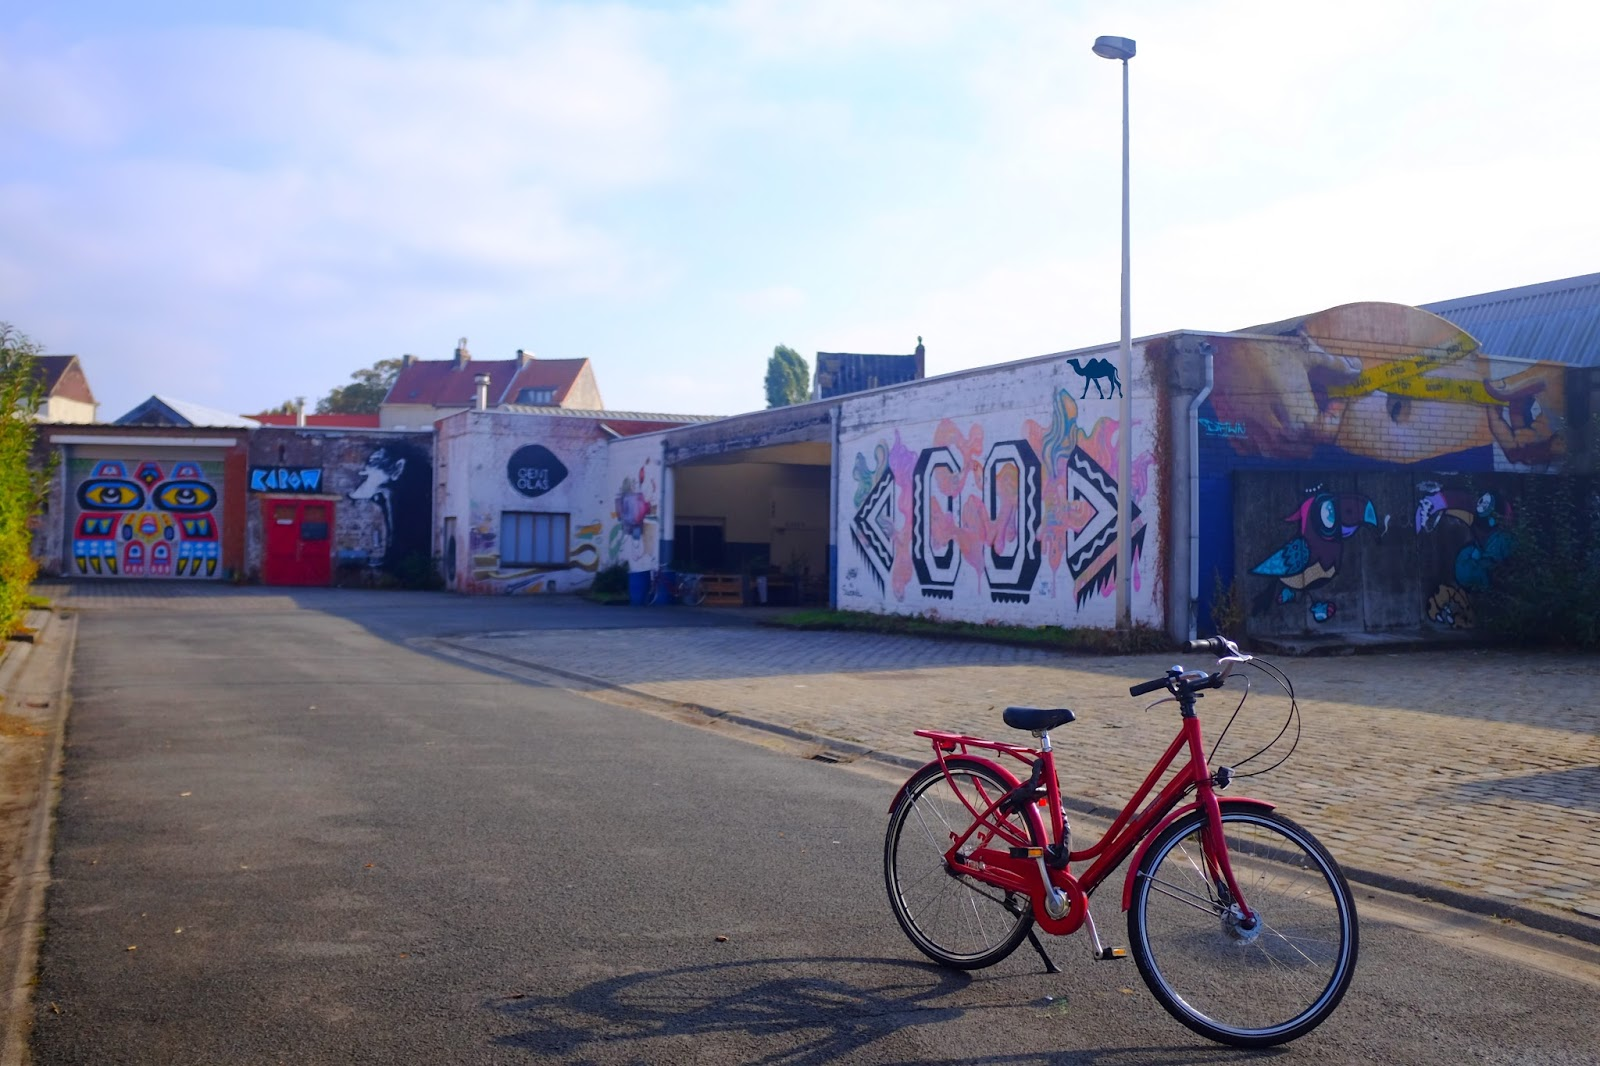 Le Chameau Bleu - Blog Voyage Gand Belgique - Gent Glas- Belgium  Street Art à Gand